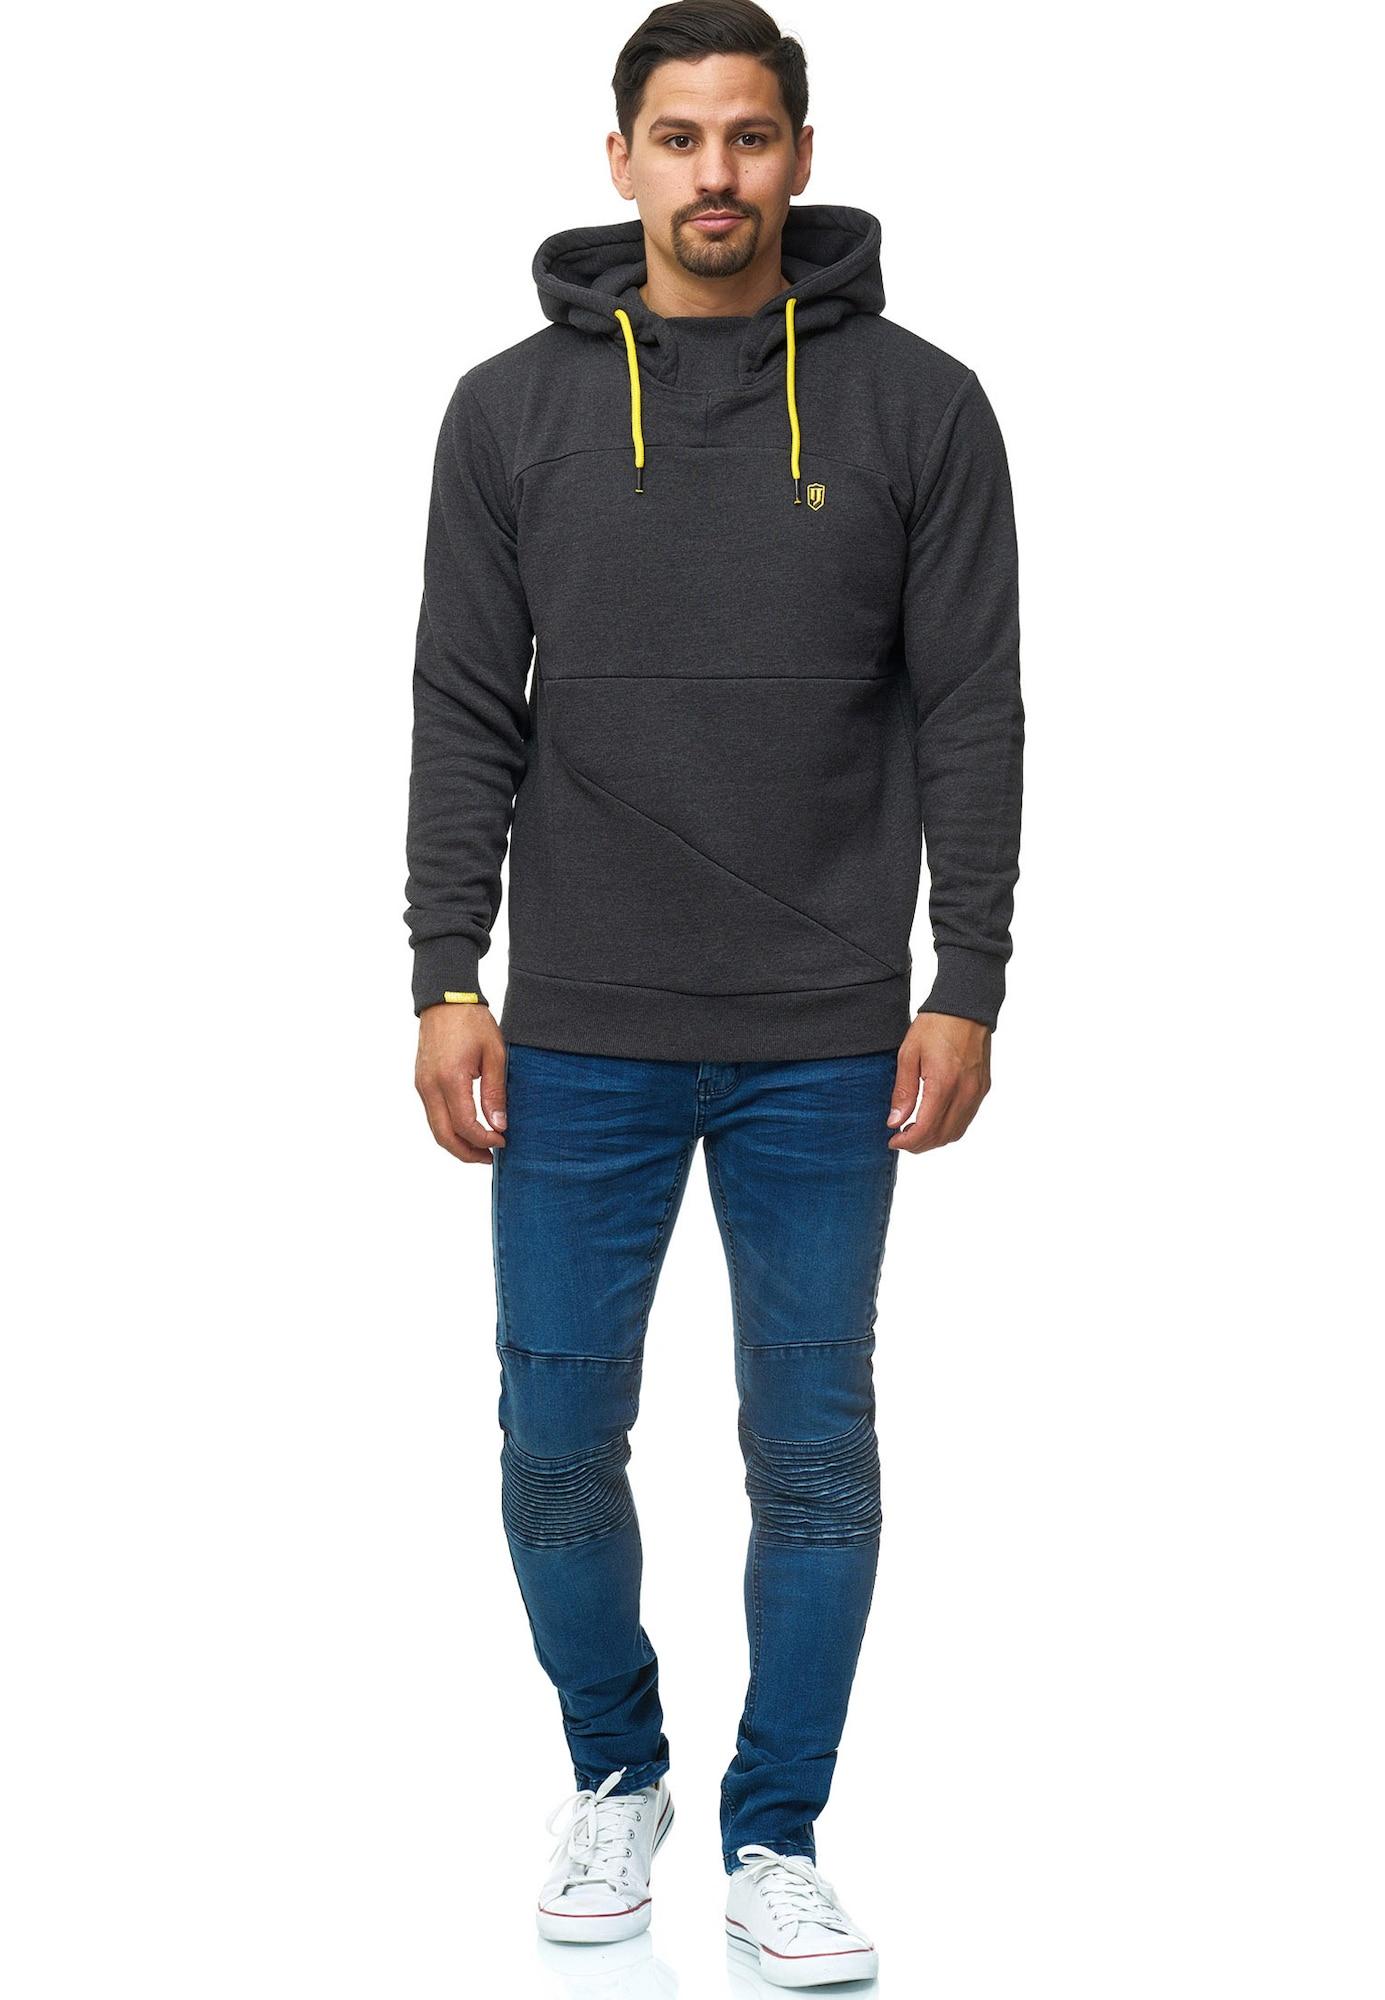 Jeans 'Ashbridge' INDICODE JEANS